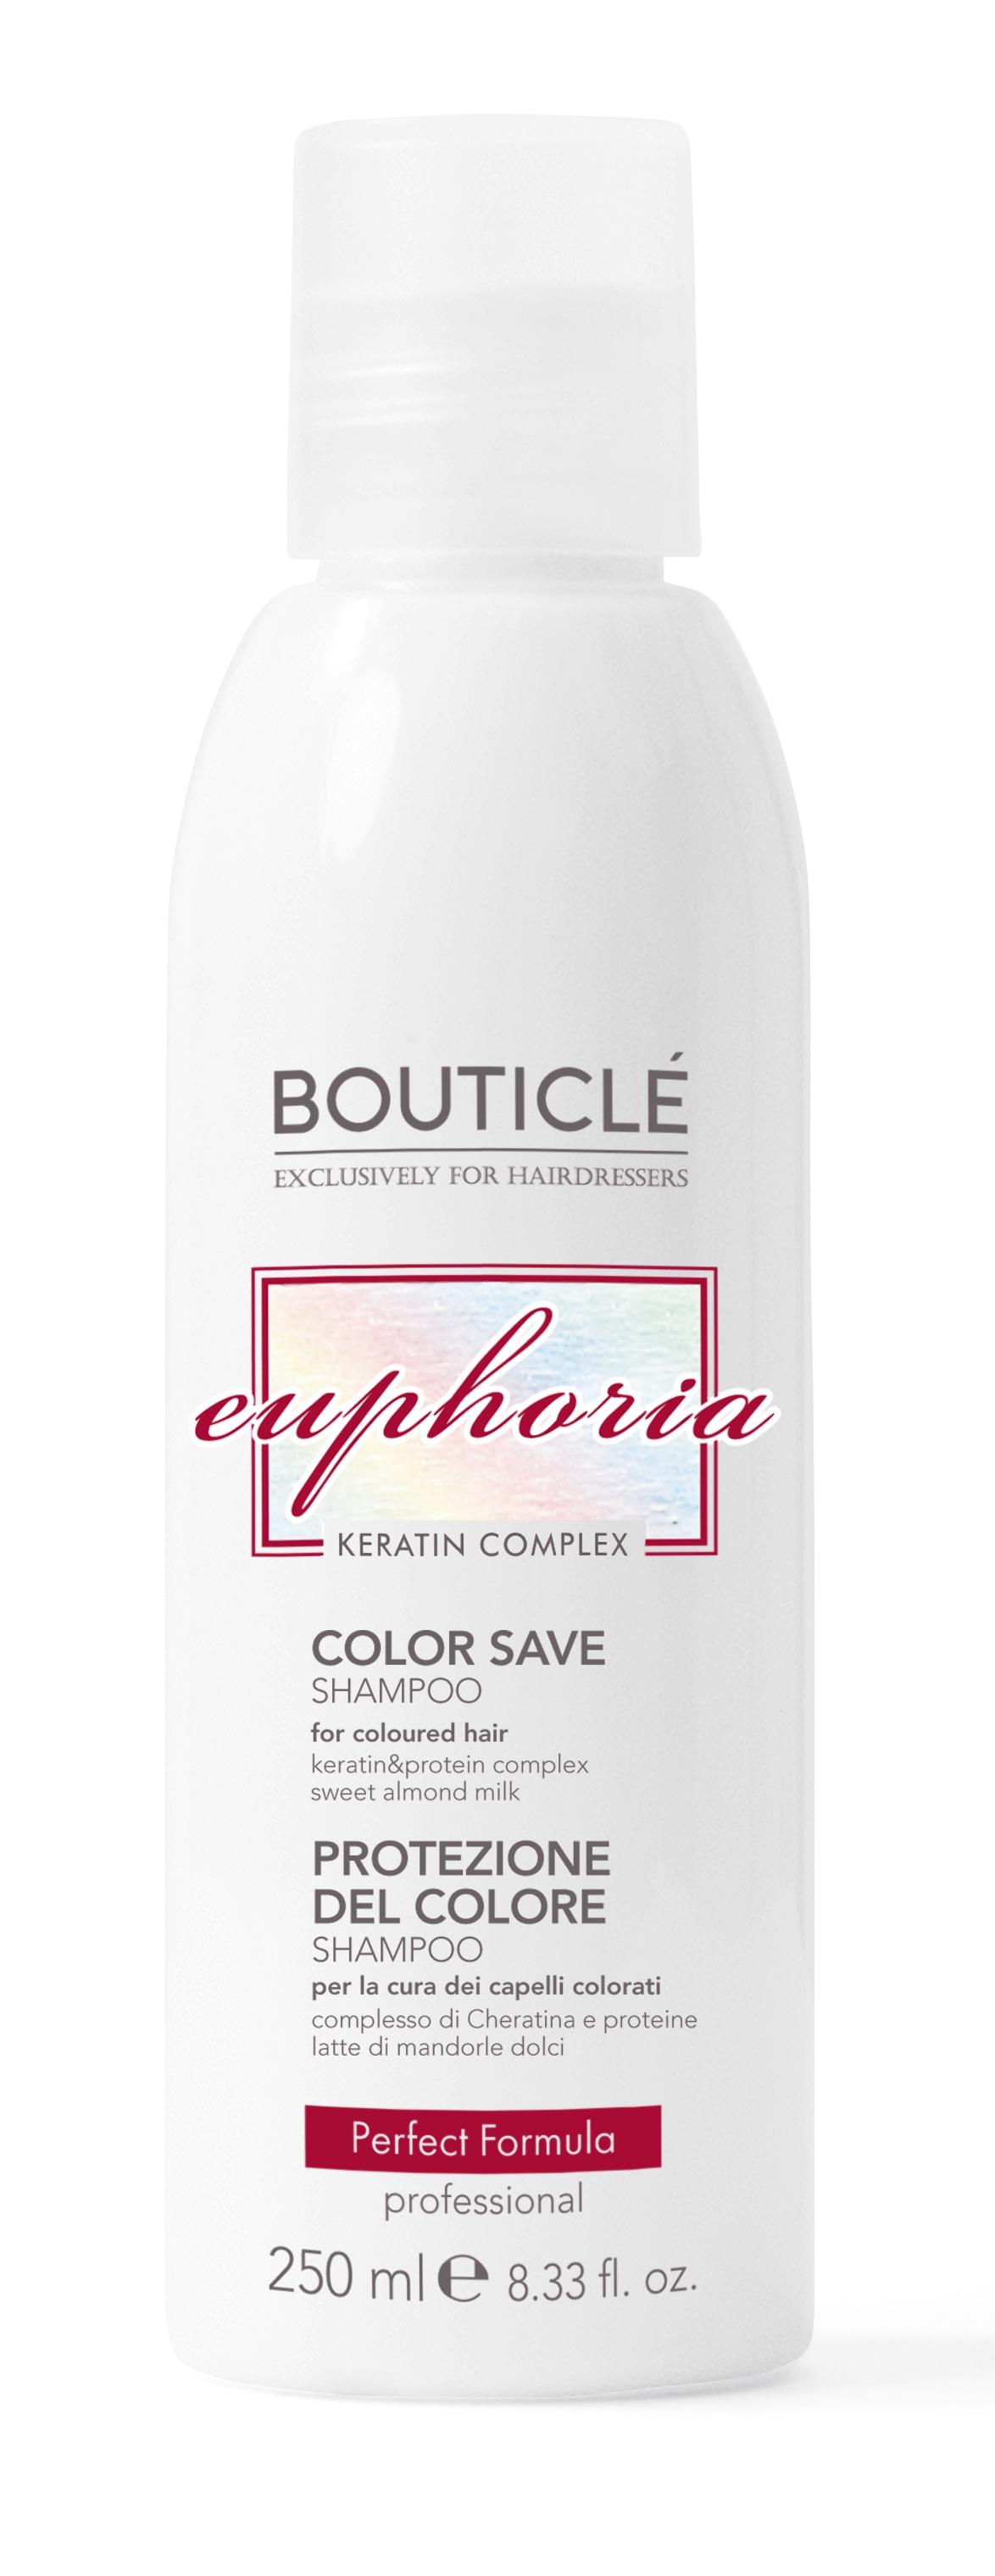 Bouticle Шампунь для Окрашенных Волос с Keratin & Protein Complex - Color Save Shampoo, 250 мл